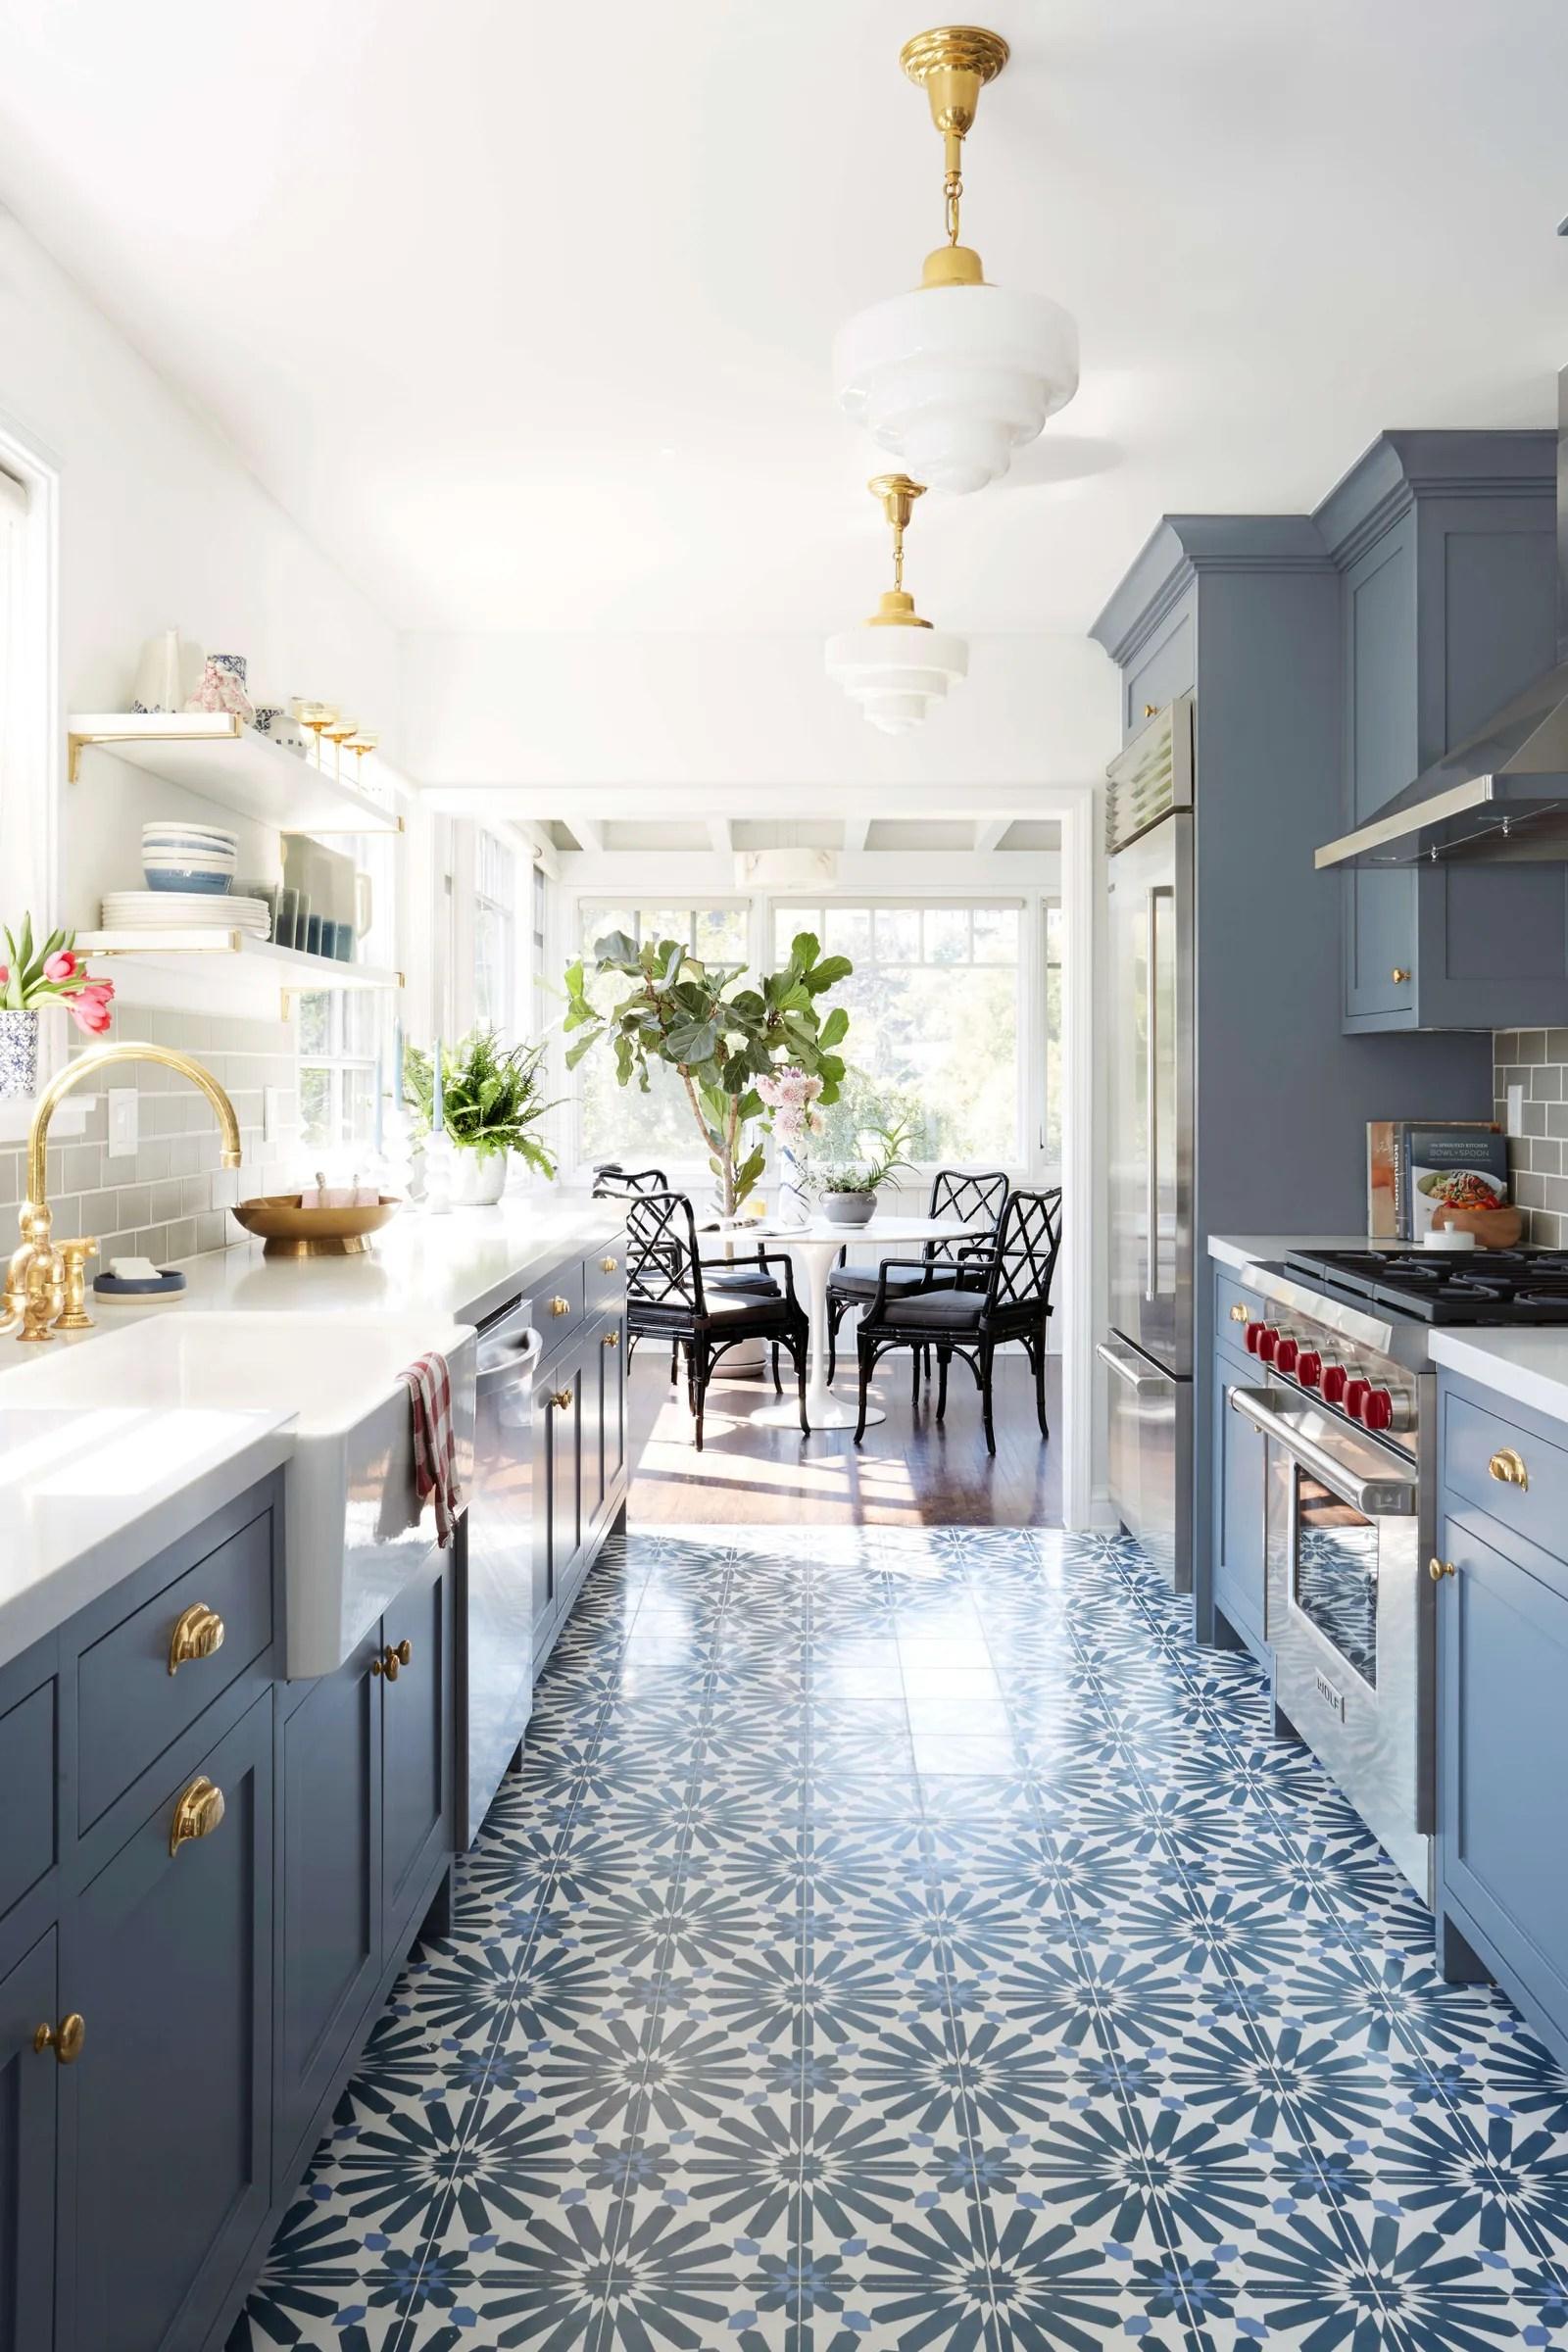 8 kitchen floor tile ideas to brighten